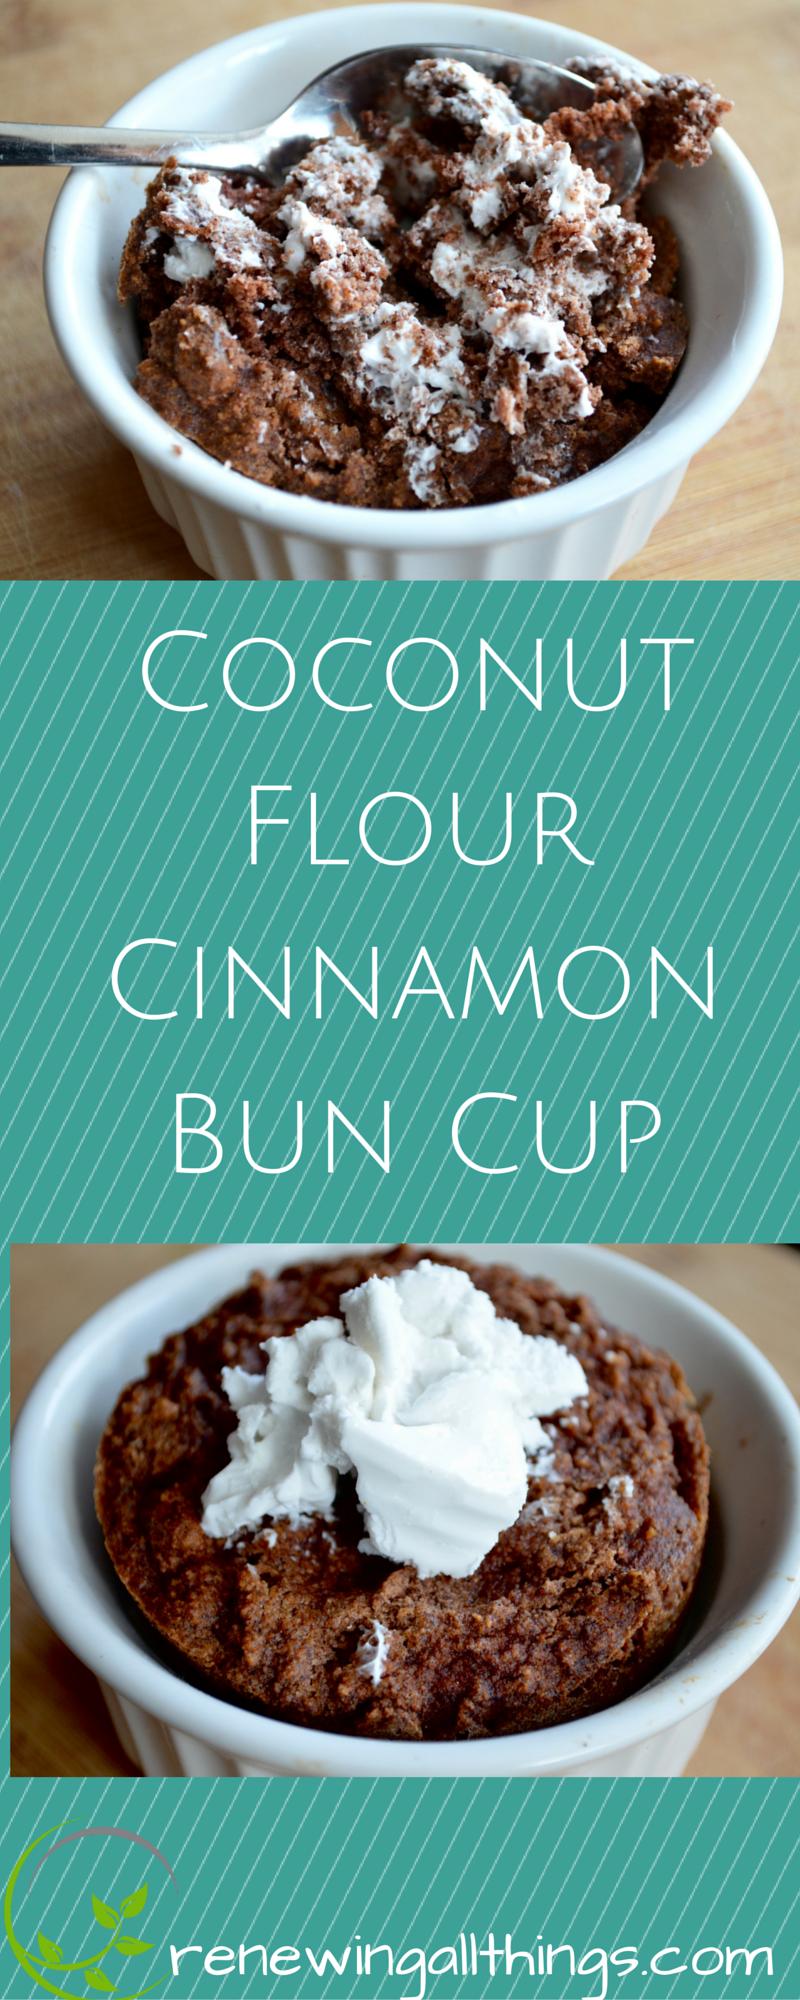 Coconut Flour Cinnamon Bun Cup